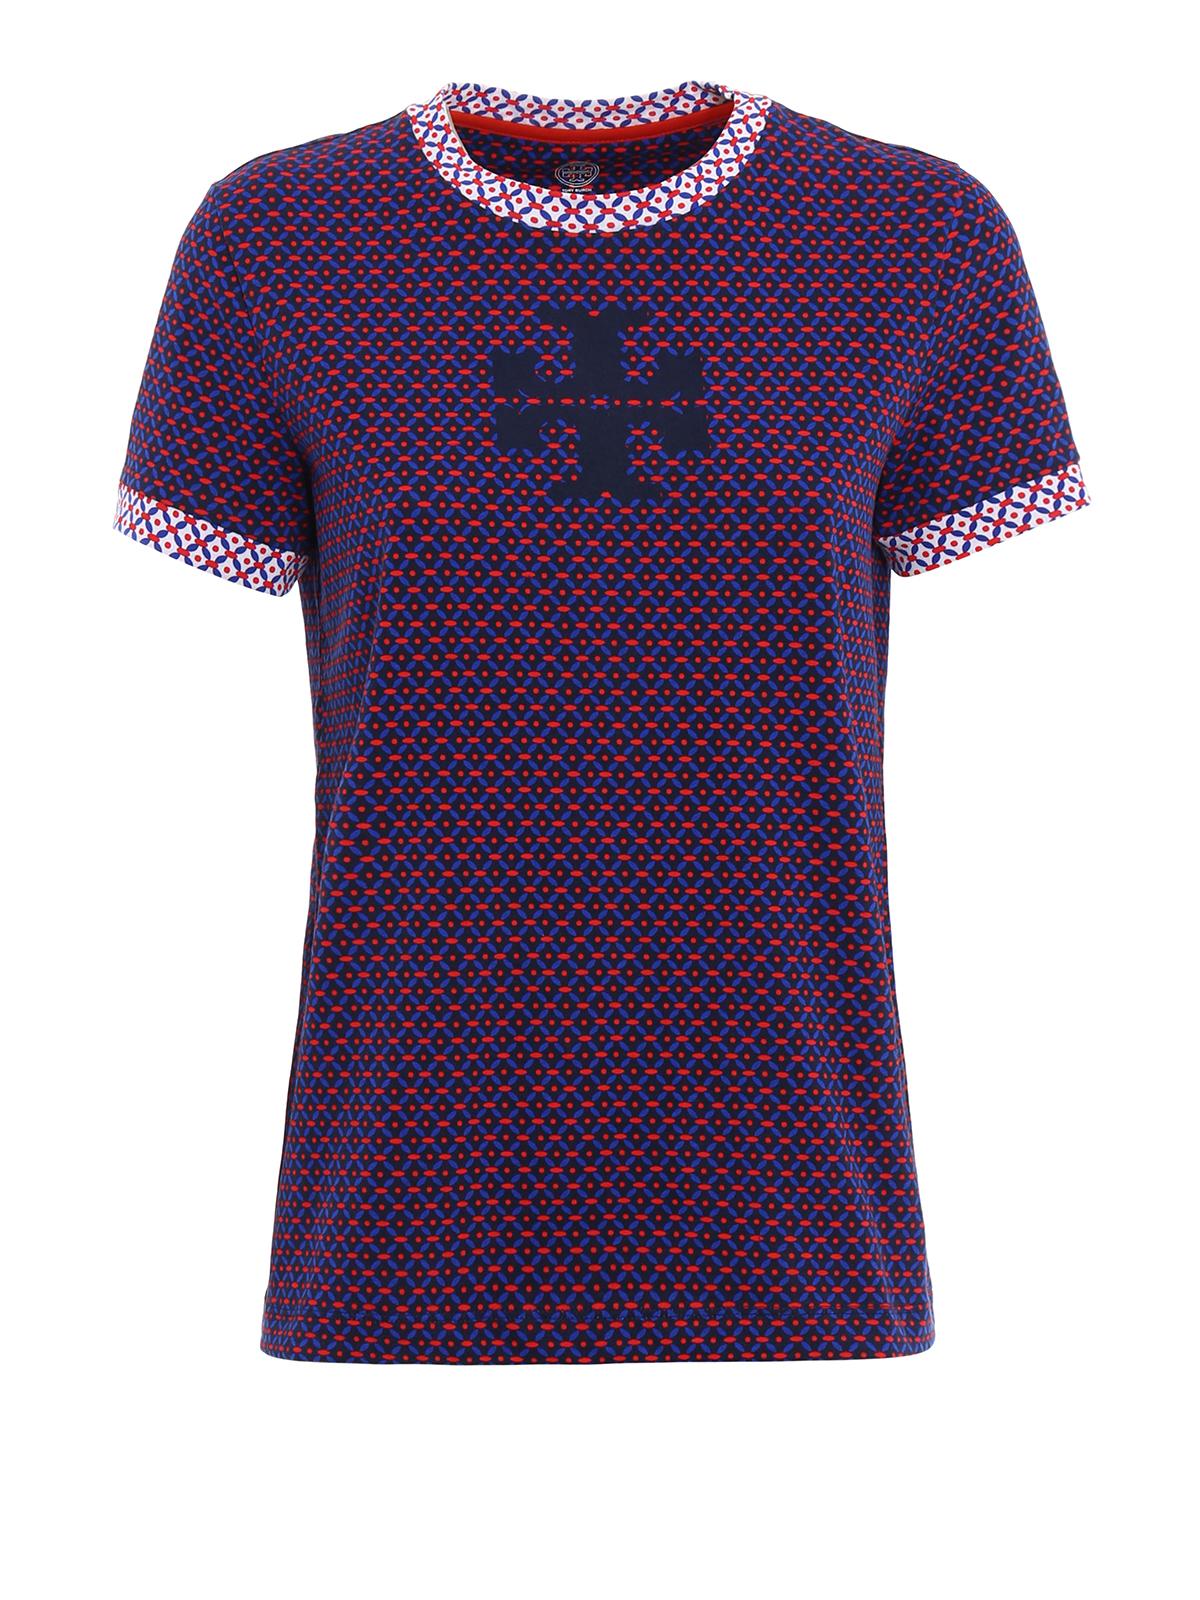 Kendall t shirt by tory burch t shirts ikrix for Tory burch t shirt